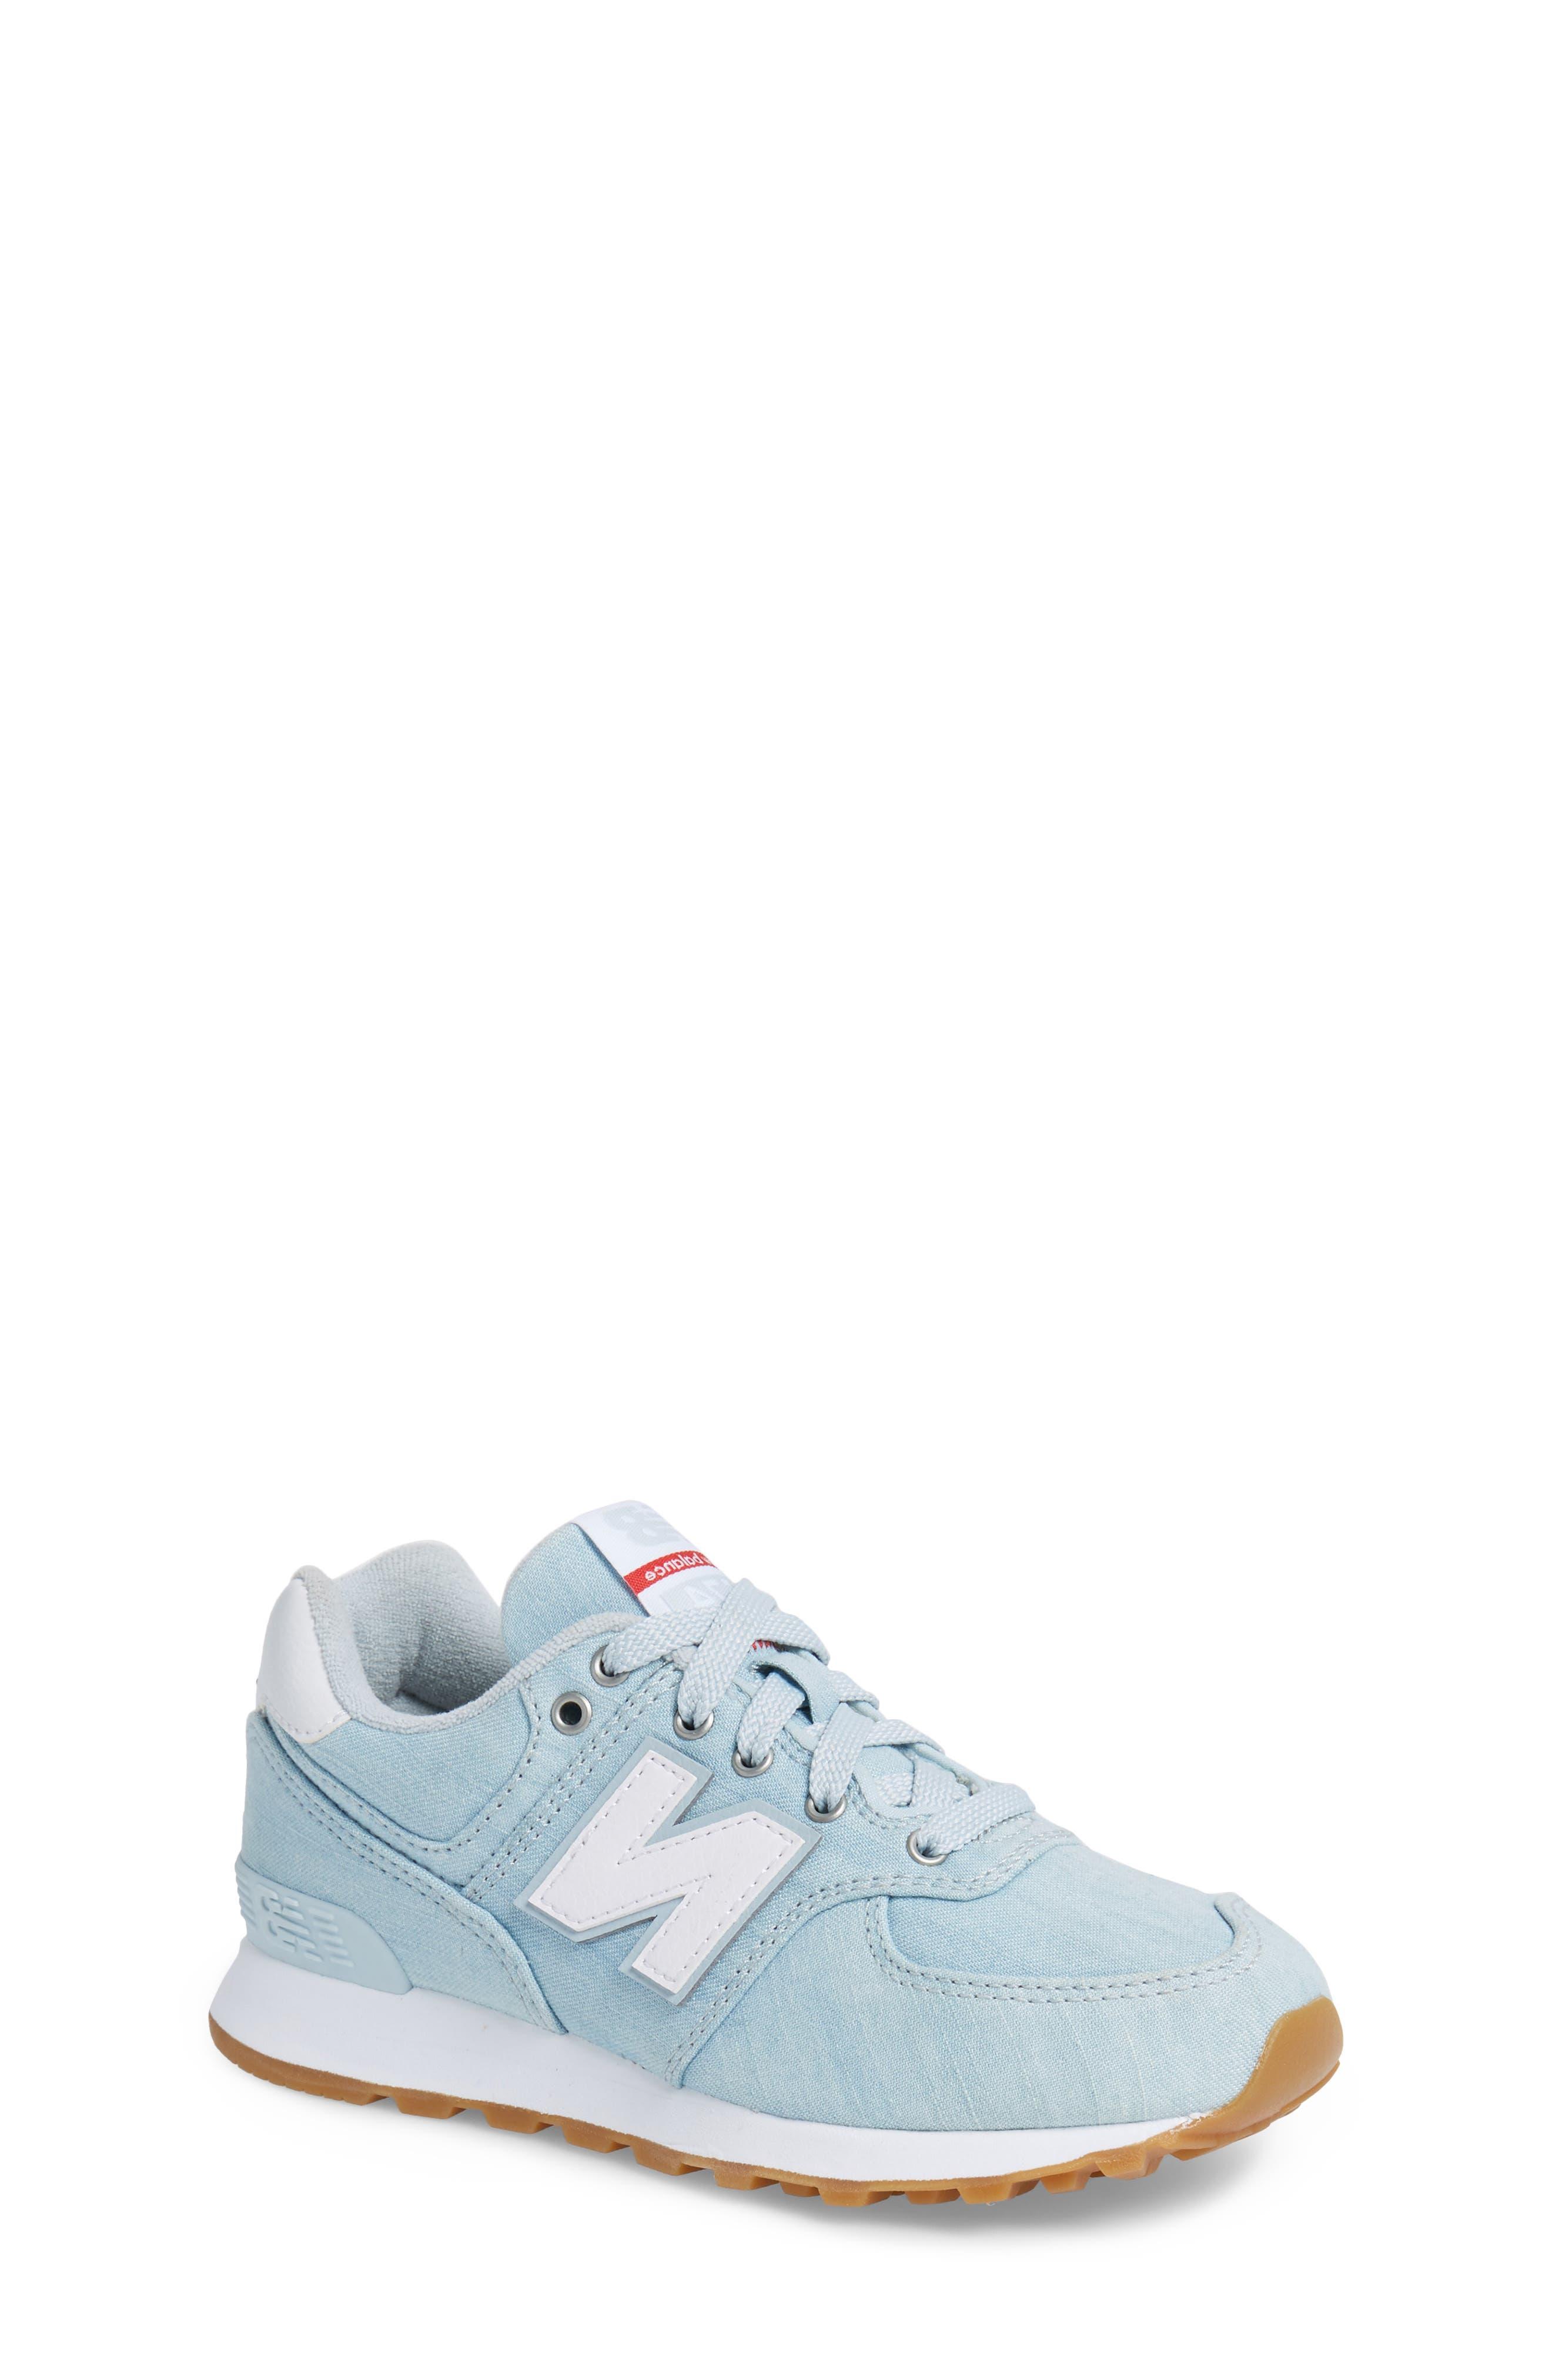 574v1 Sneaker,                         Main,                         color, Light Porcelain Blue